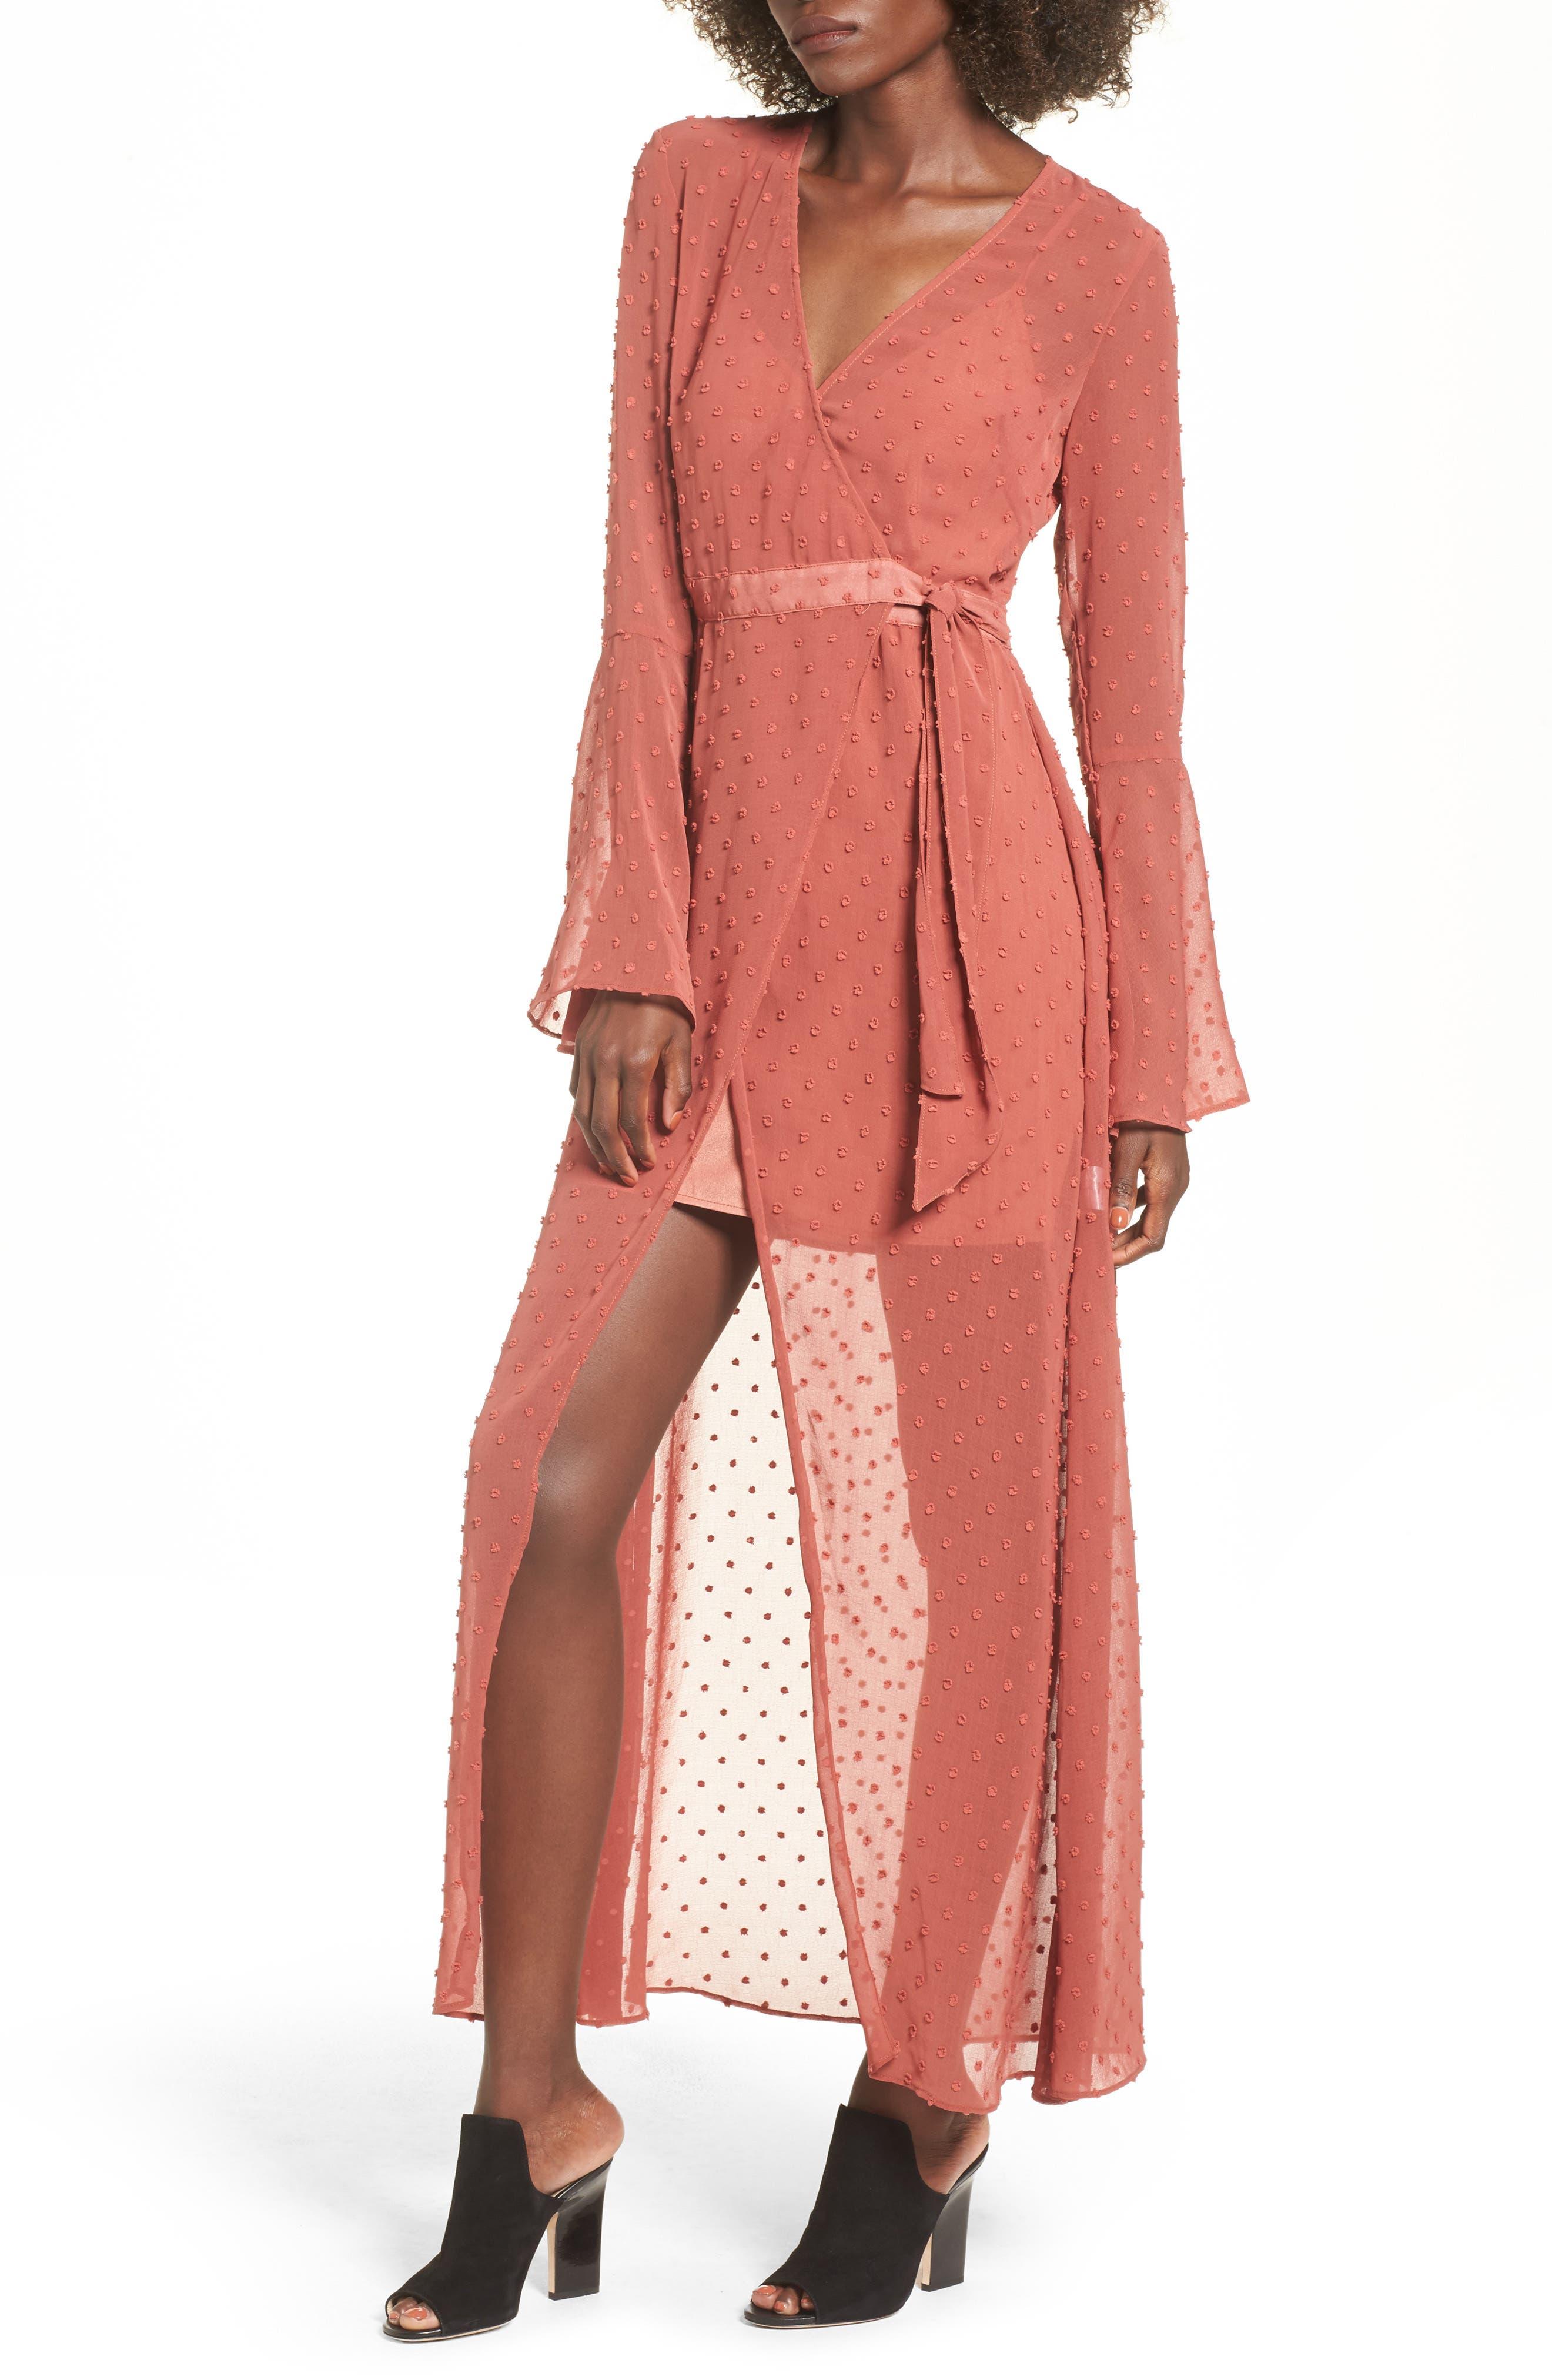 Freya Bell Sleeve Wrap Maxi Dress,                         Main,                         color, 200